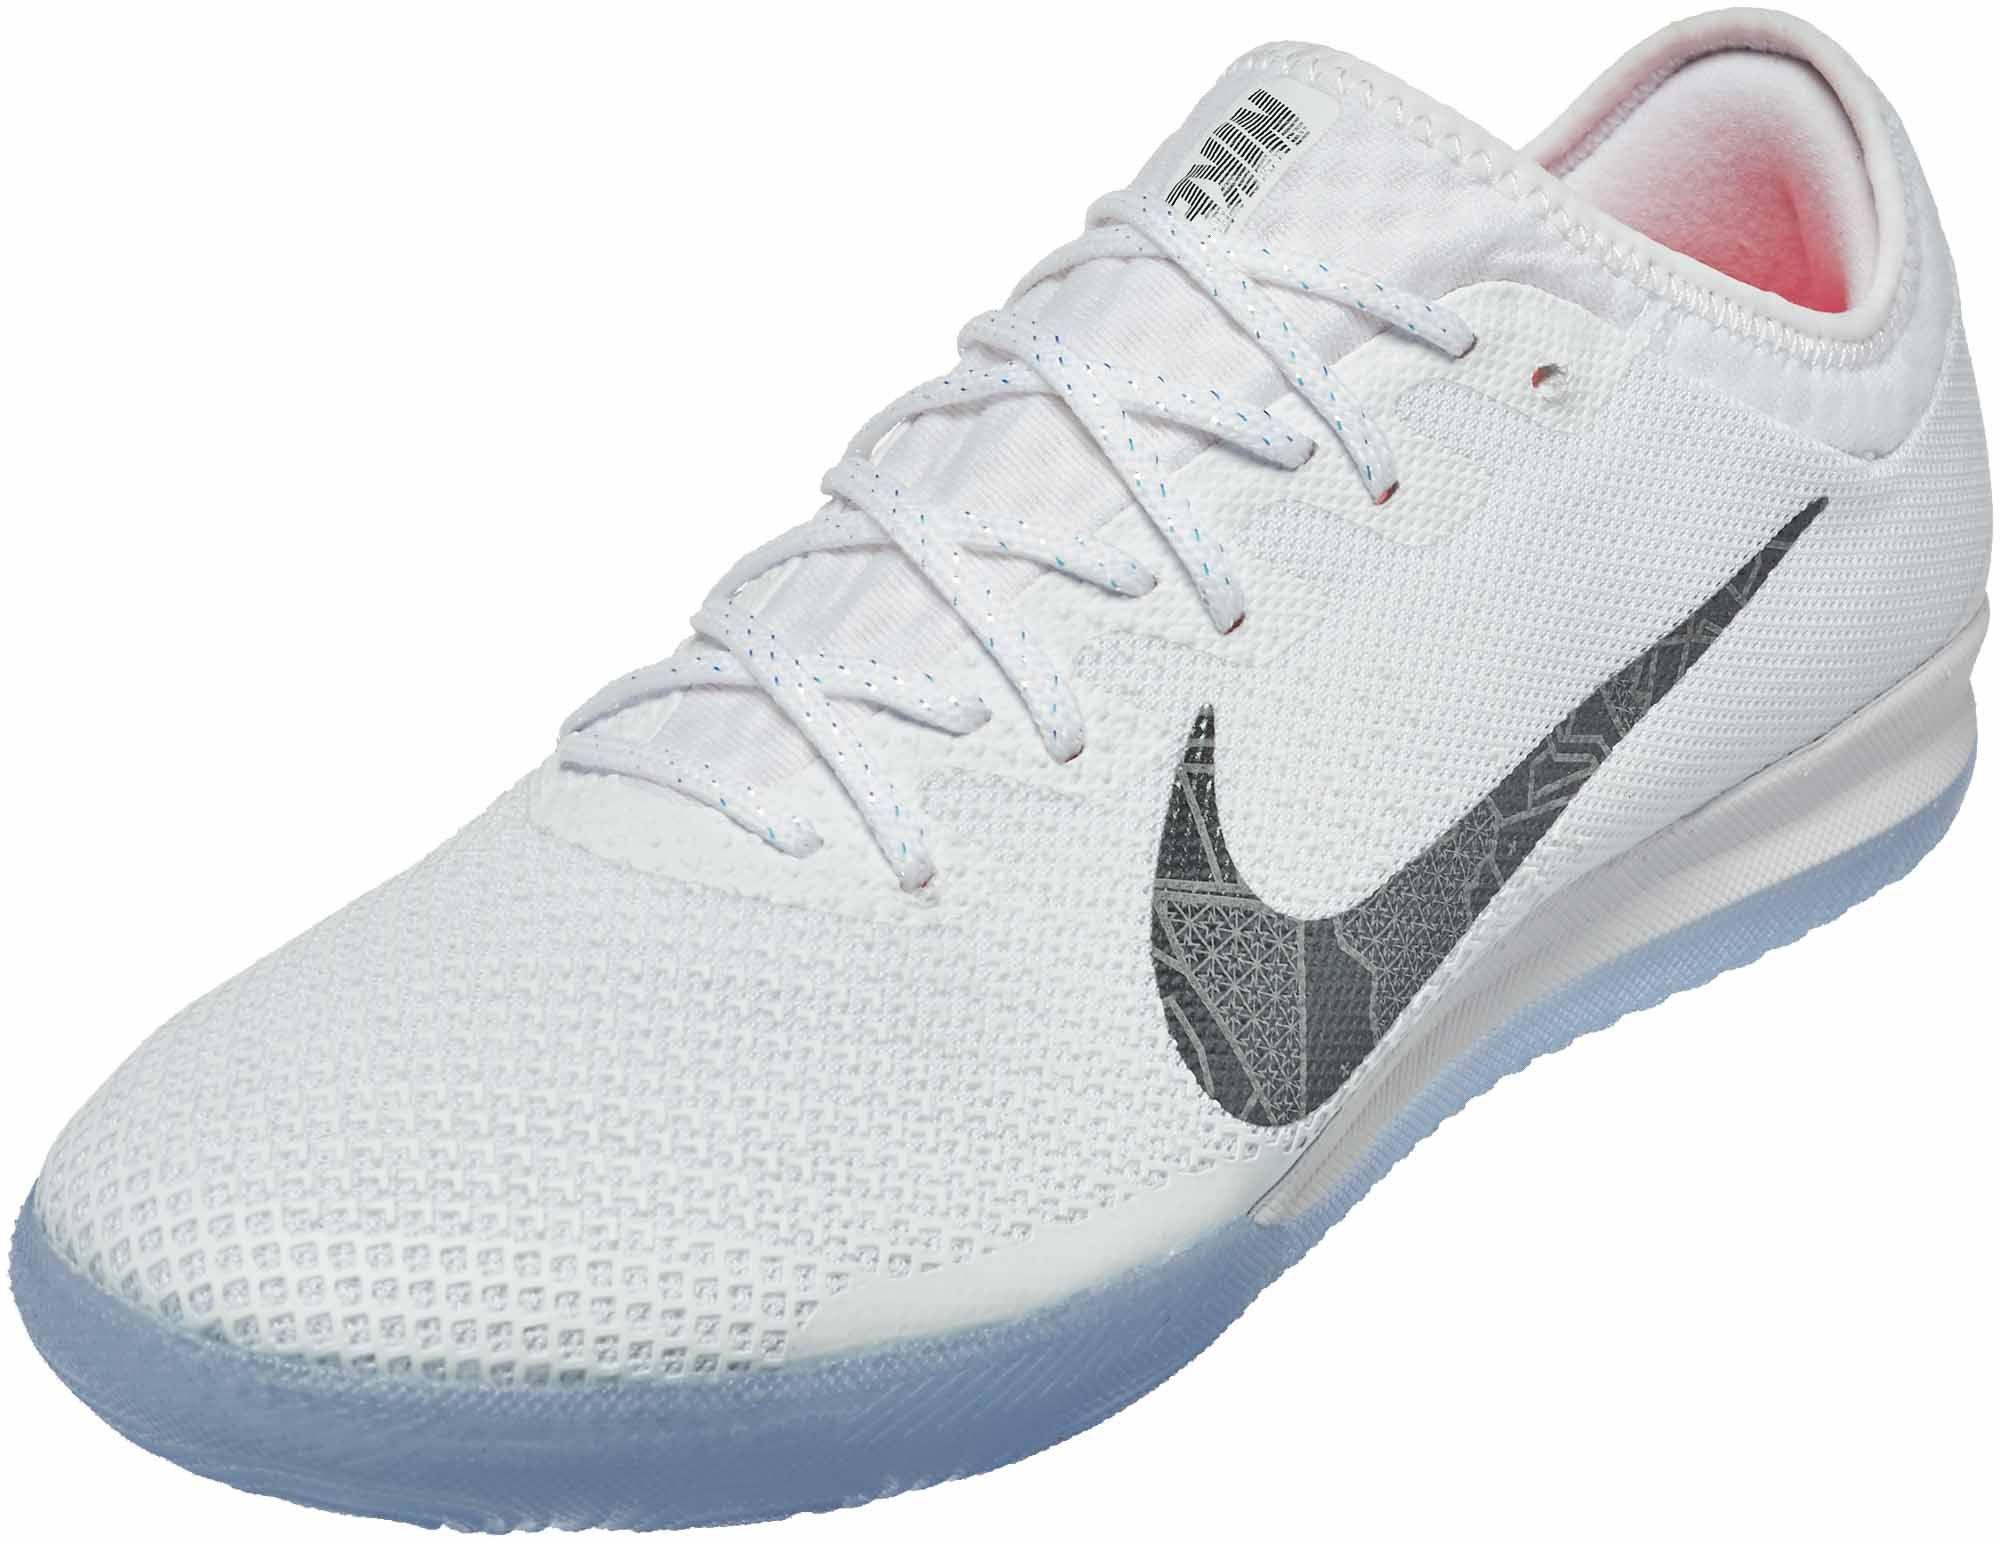 Pin on Nike Mercurial Vapor Soccer Shoes